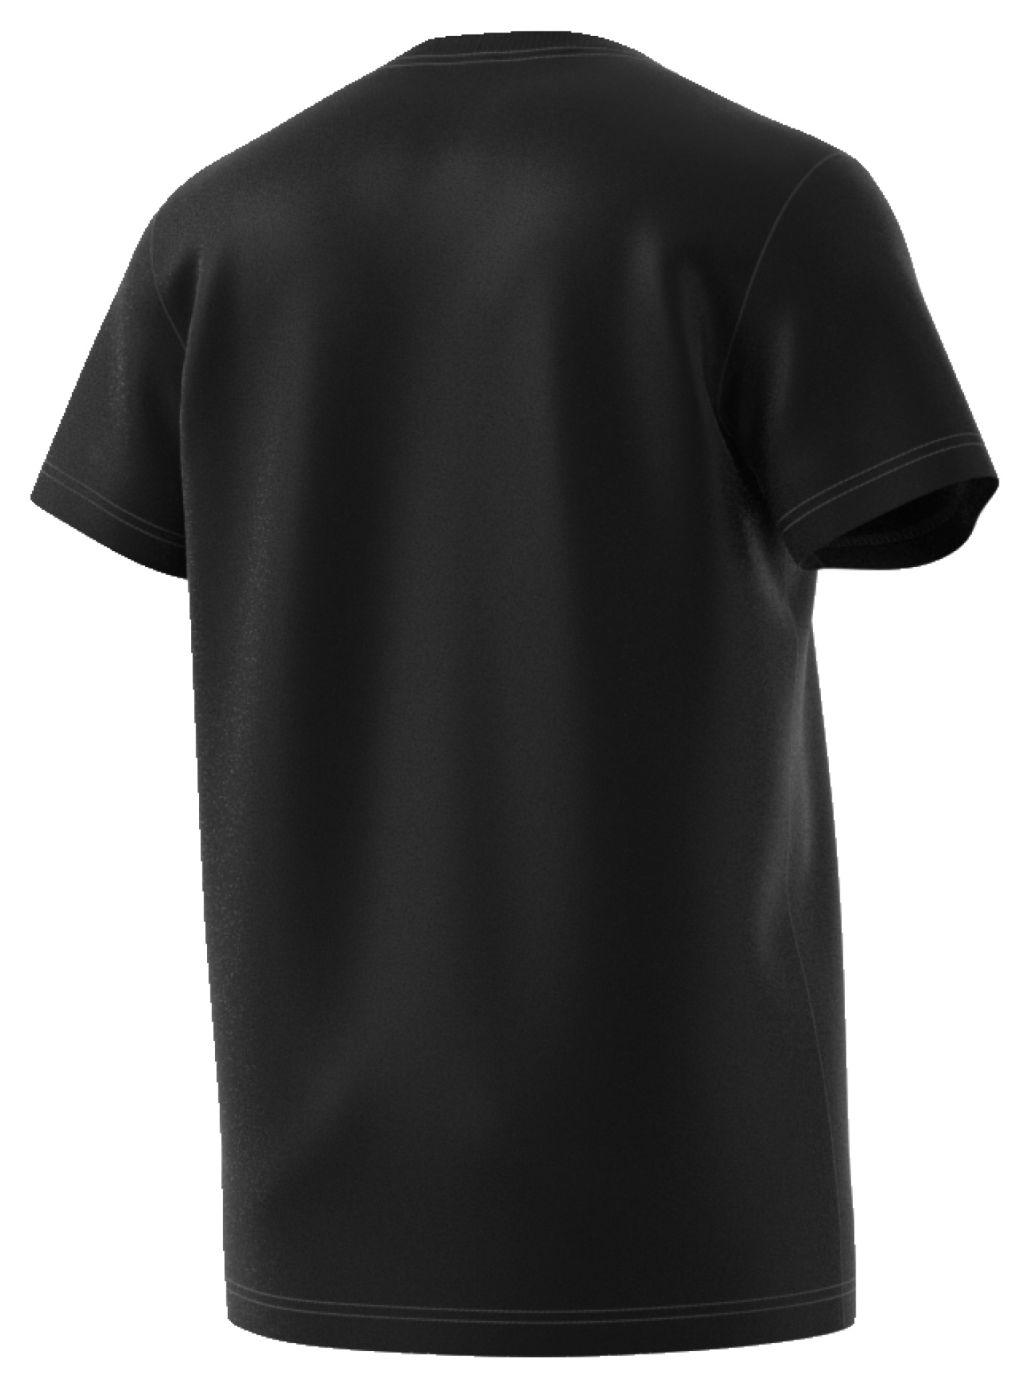 Adidas Athletic Vibe miesten t-paita Musta 946bc6542f